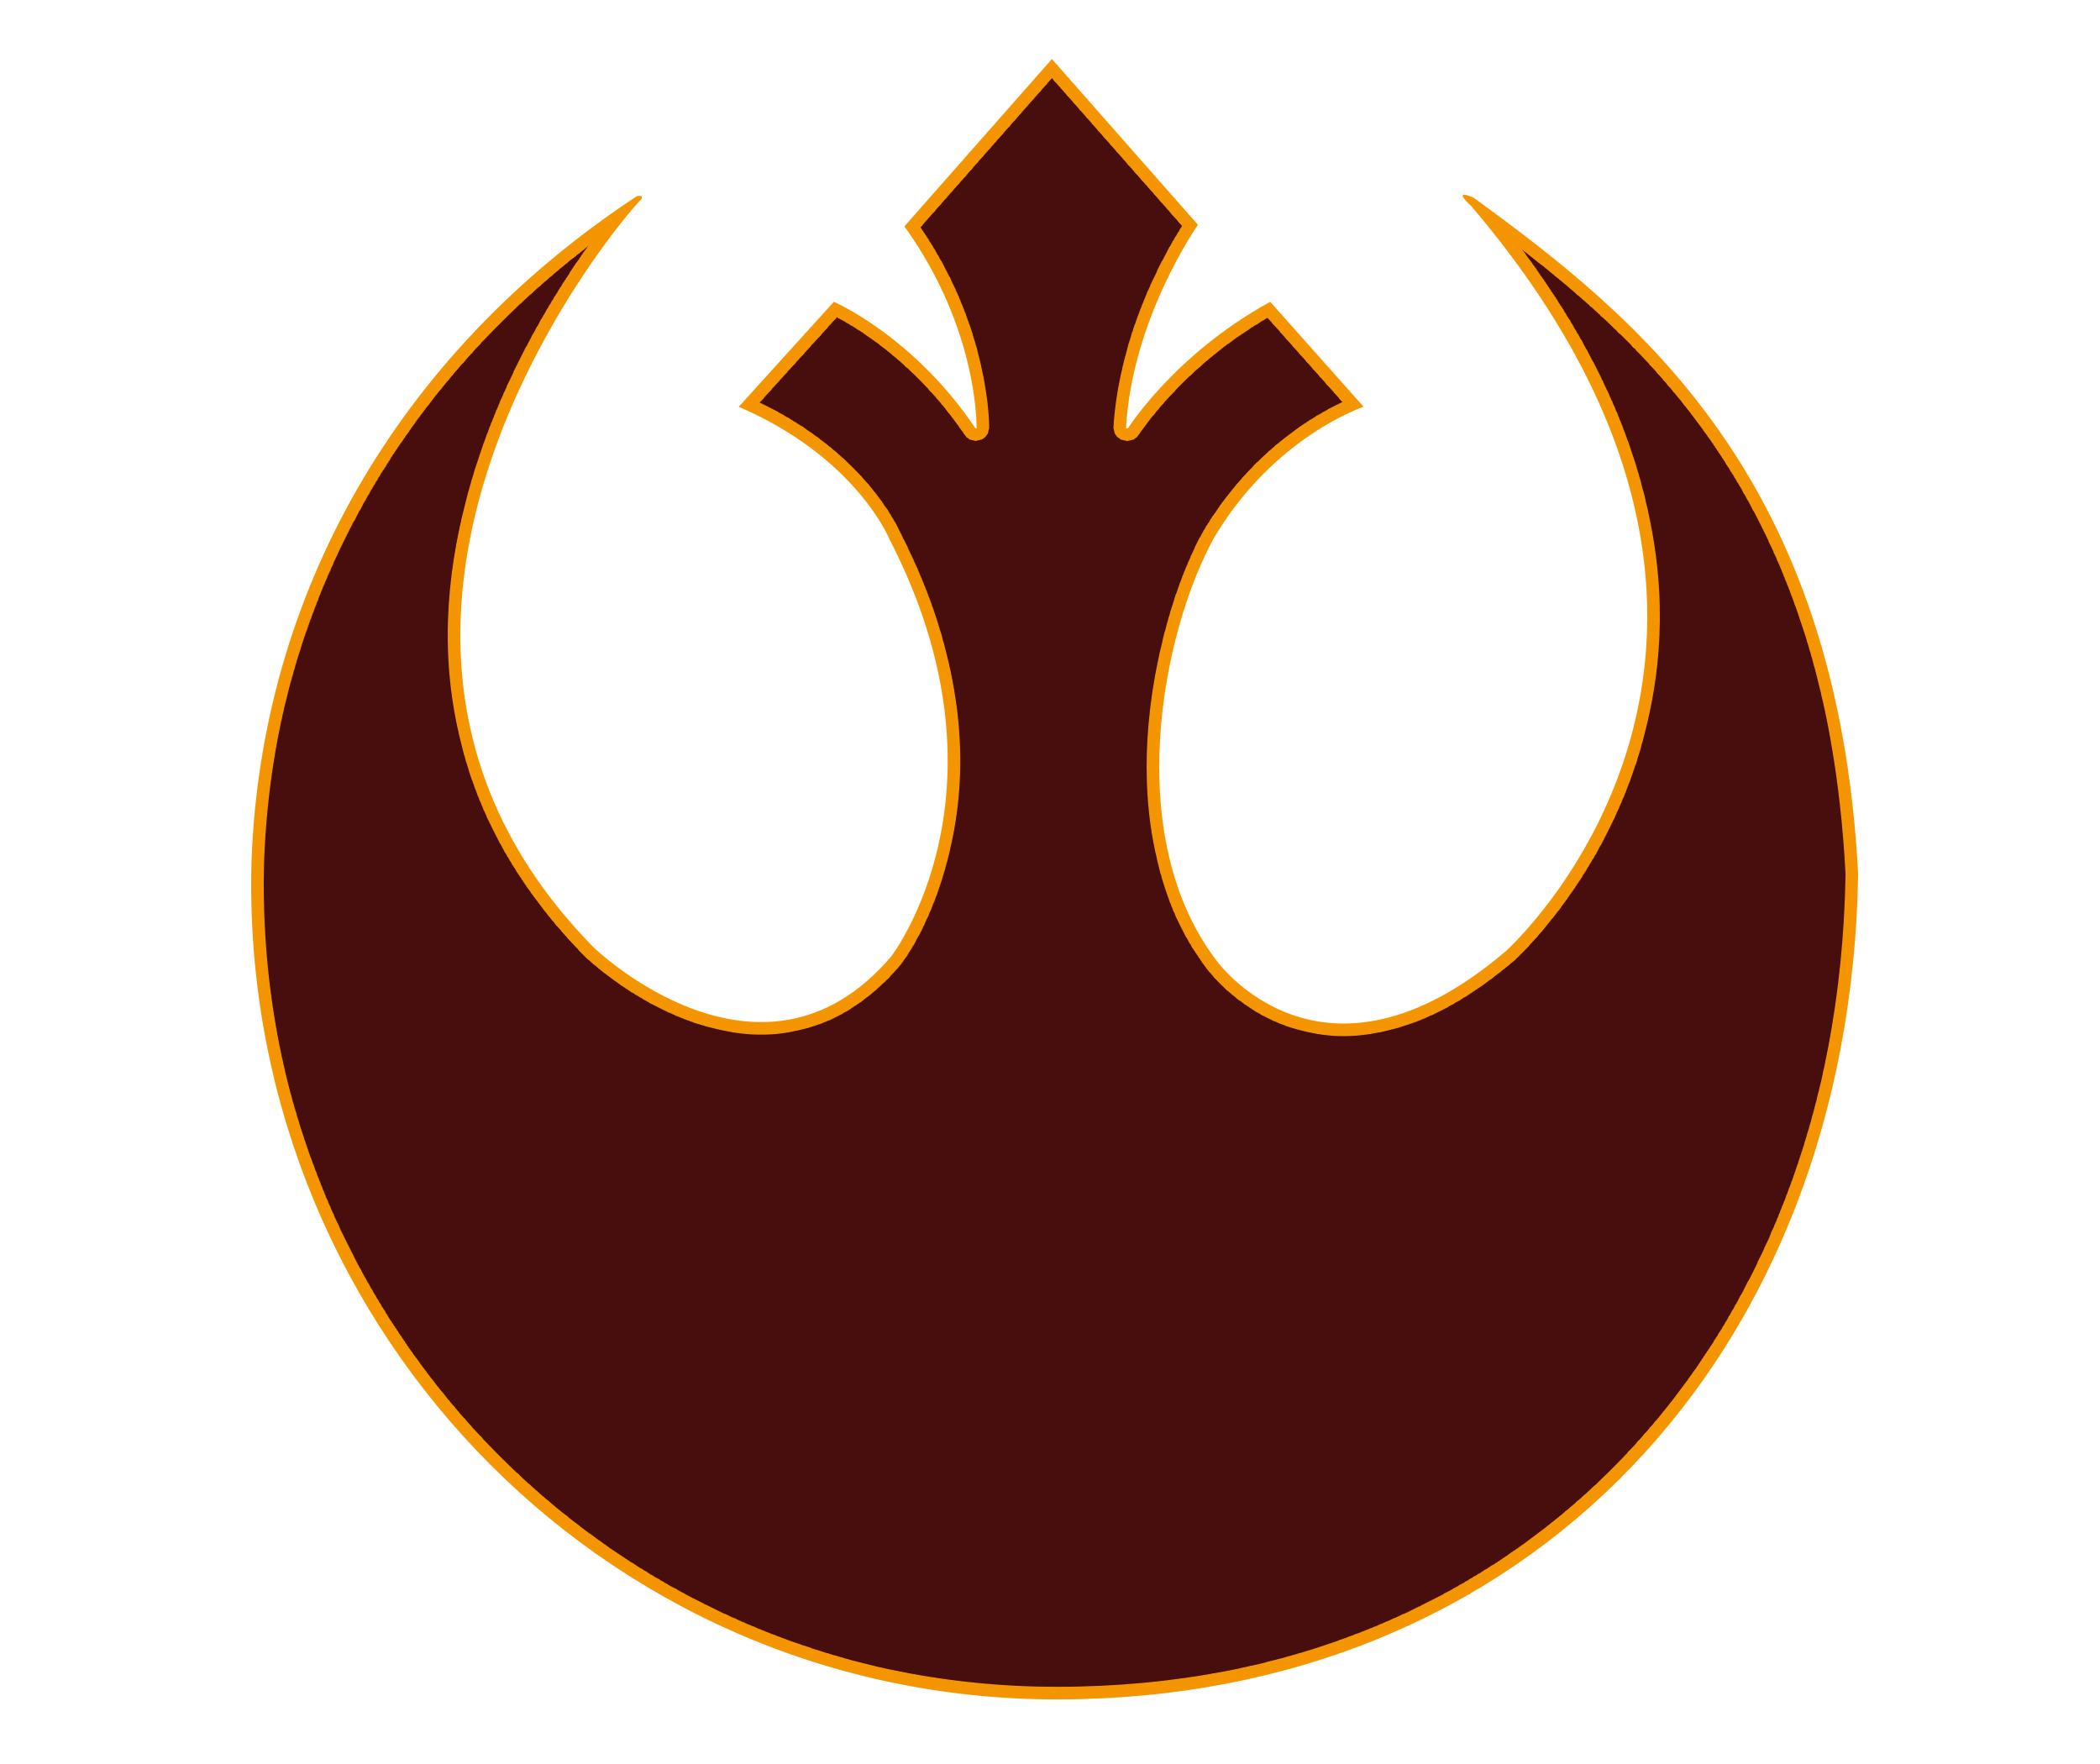 Logo star wars histoire image de symbole et embl me - Republic star wars logo ...